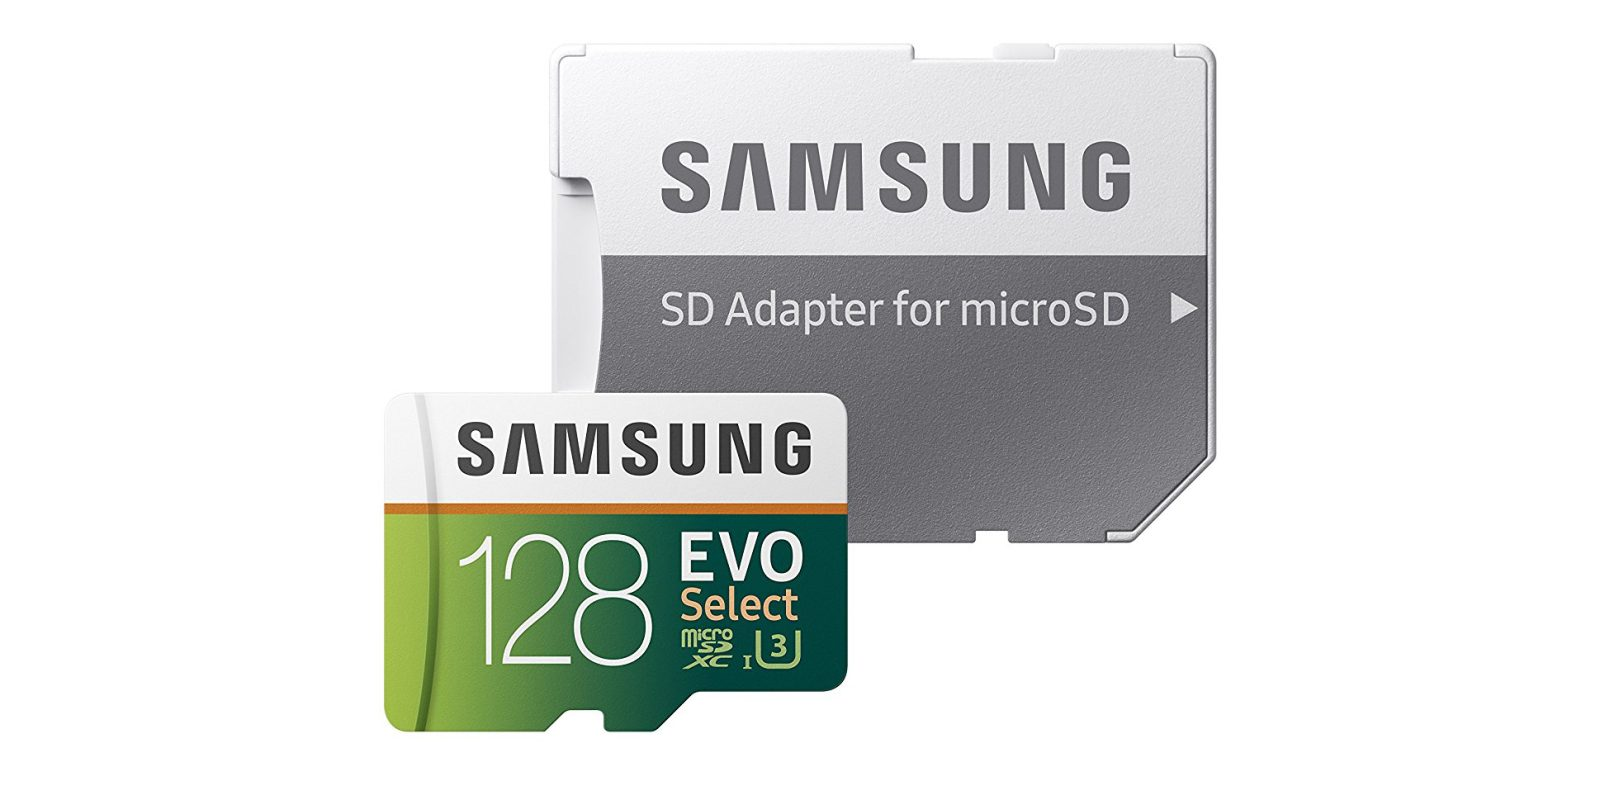 Samsung EVO 128GB microSD card w/ adapter now $37 shipped at Amazon